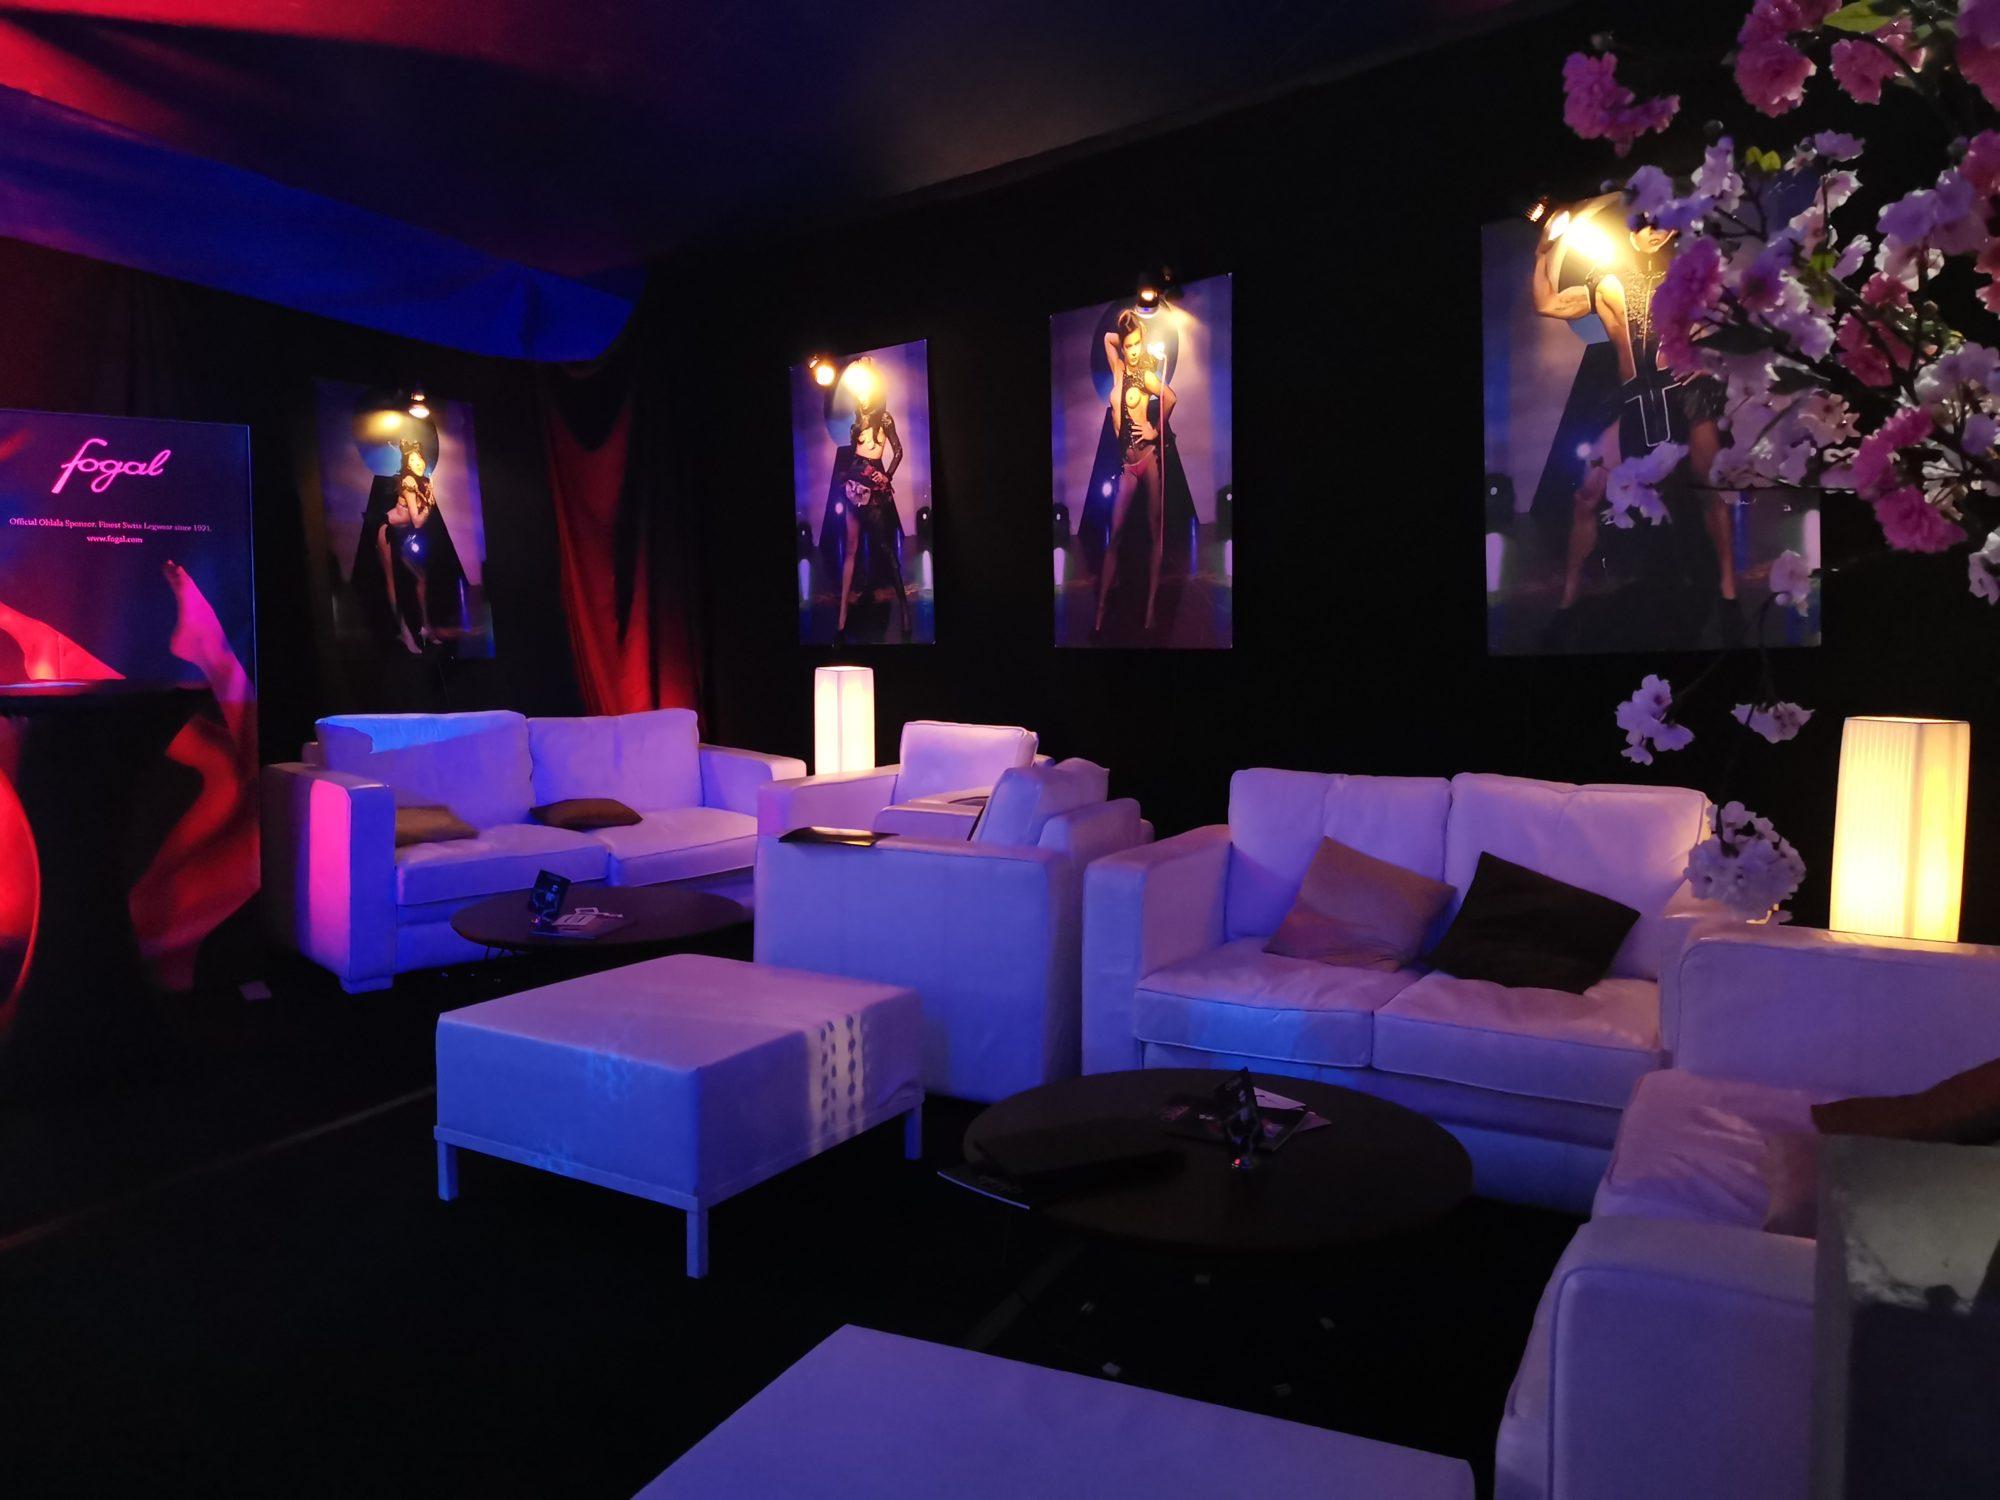 santorini sessel mieten rent-a-lounge 2